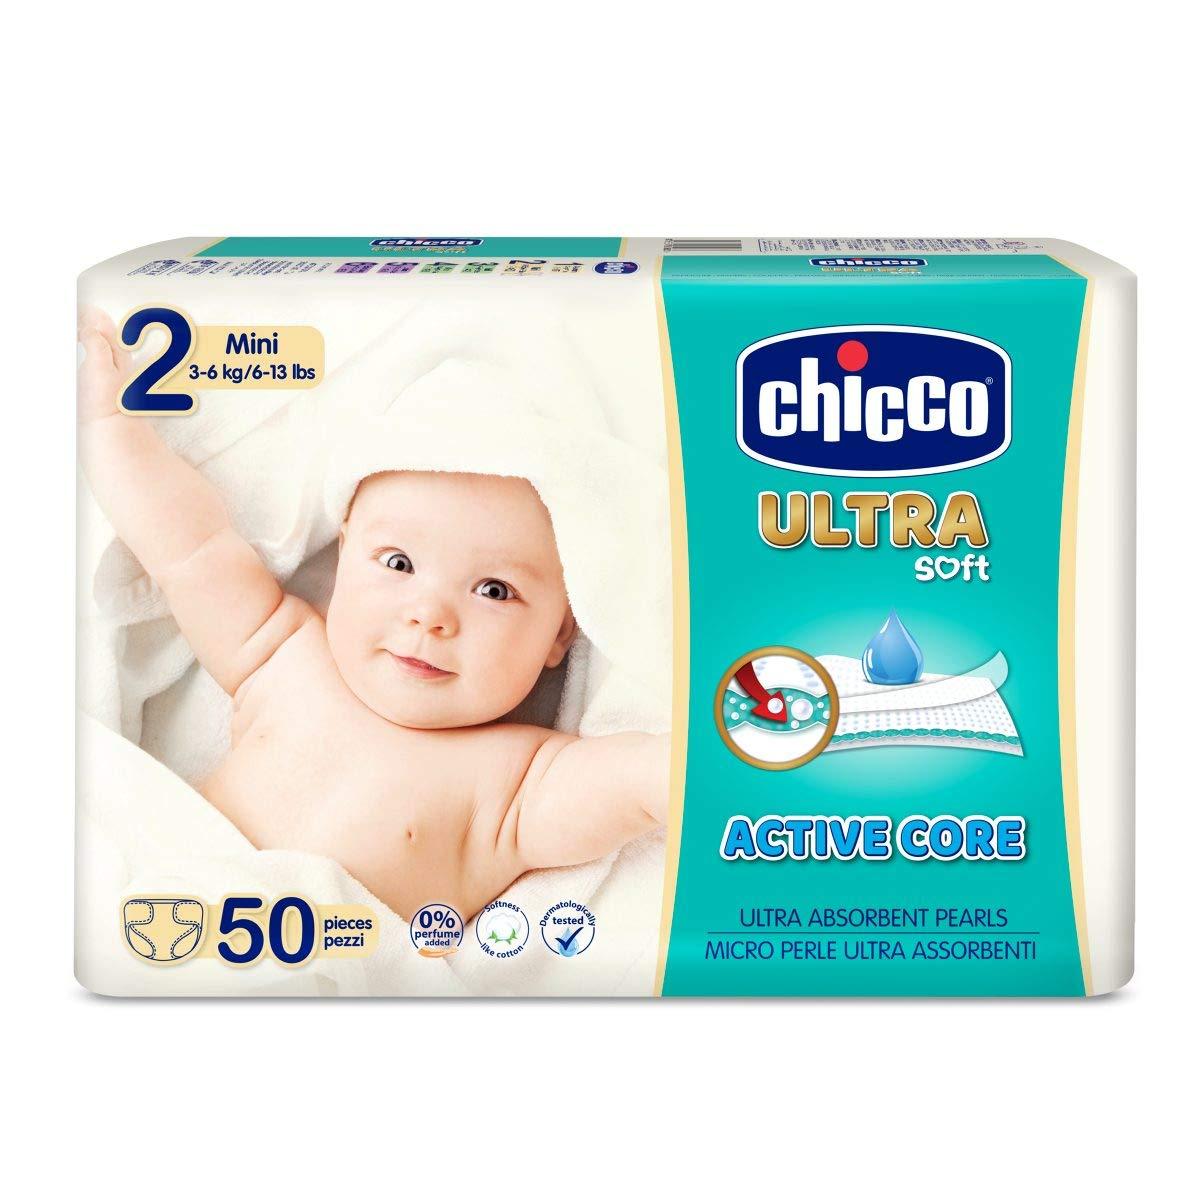 Chicco Chicco Ultra Soft 2-5 kg Talla 1 Pack 27 pa/ñales ultra absorbentes Newborn 27 ud Pa/ñales Maxi 2-5 kg 27 ud